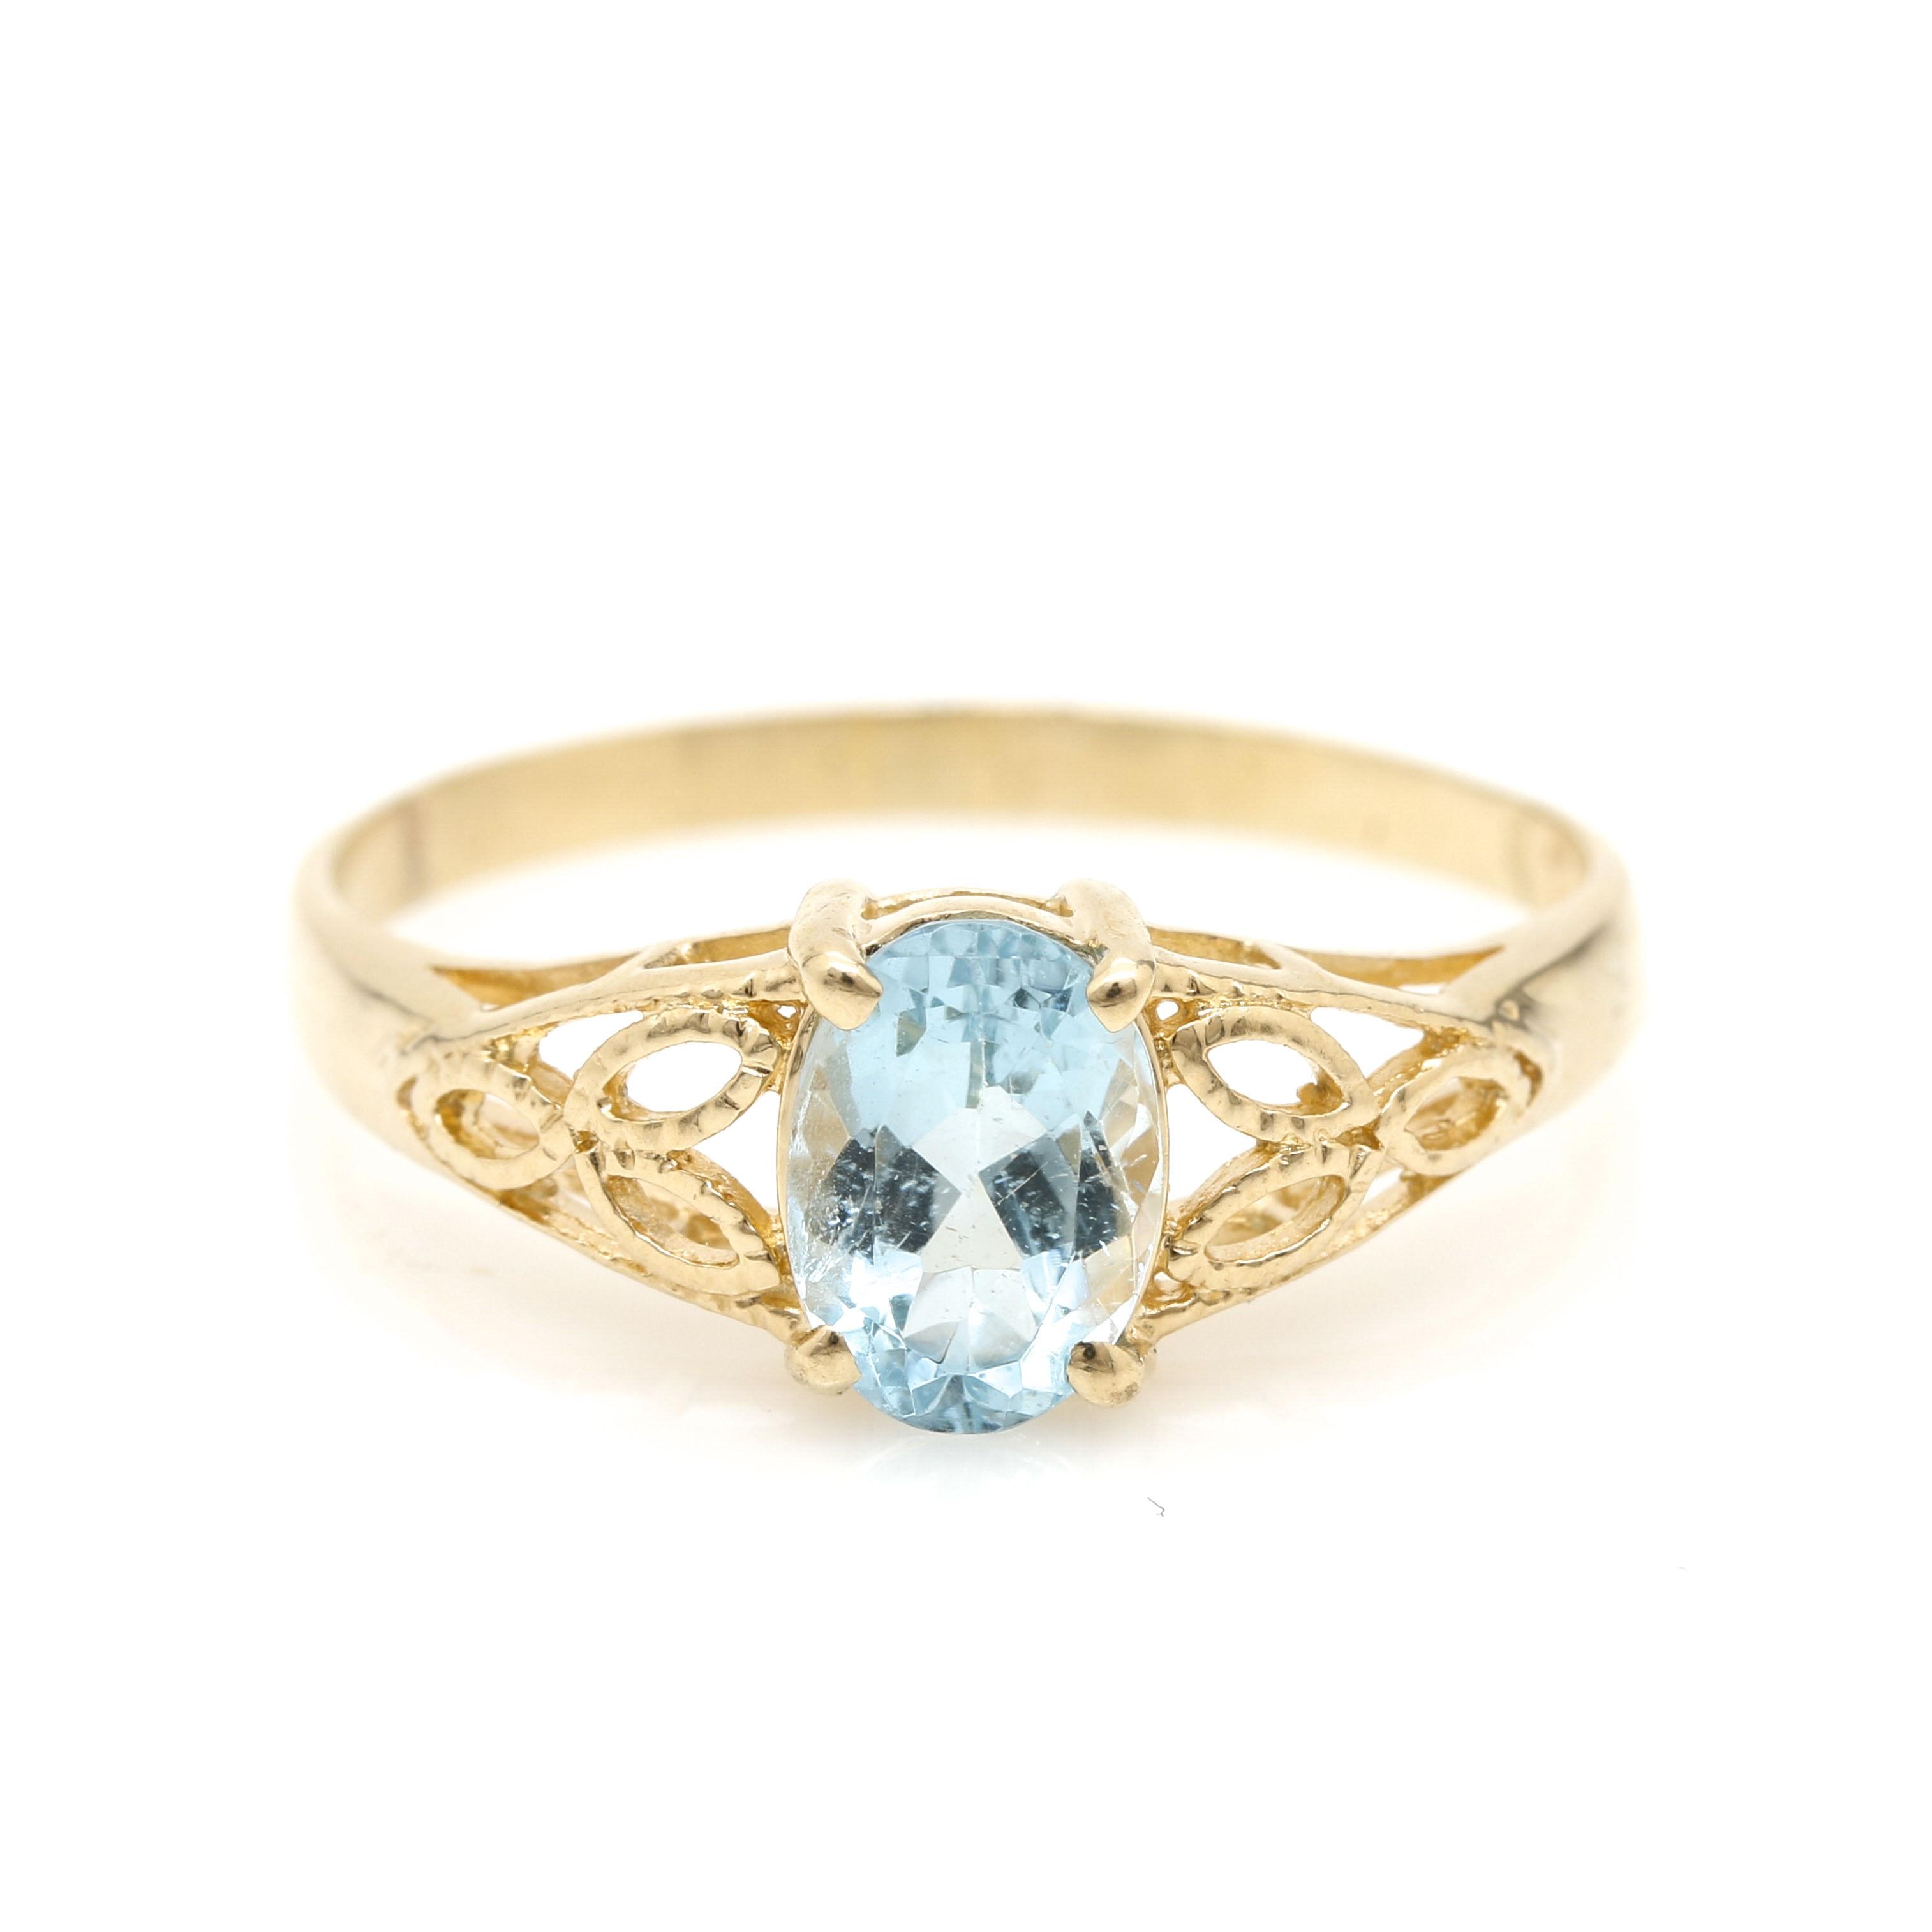 14K Yellow Gold 1.07 CT Aquamarine Ring